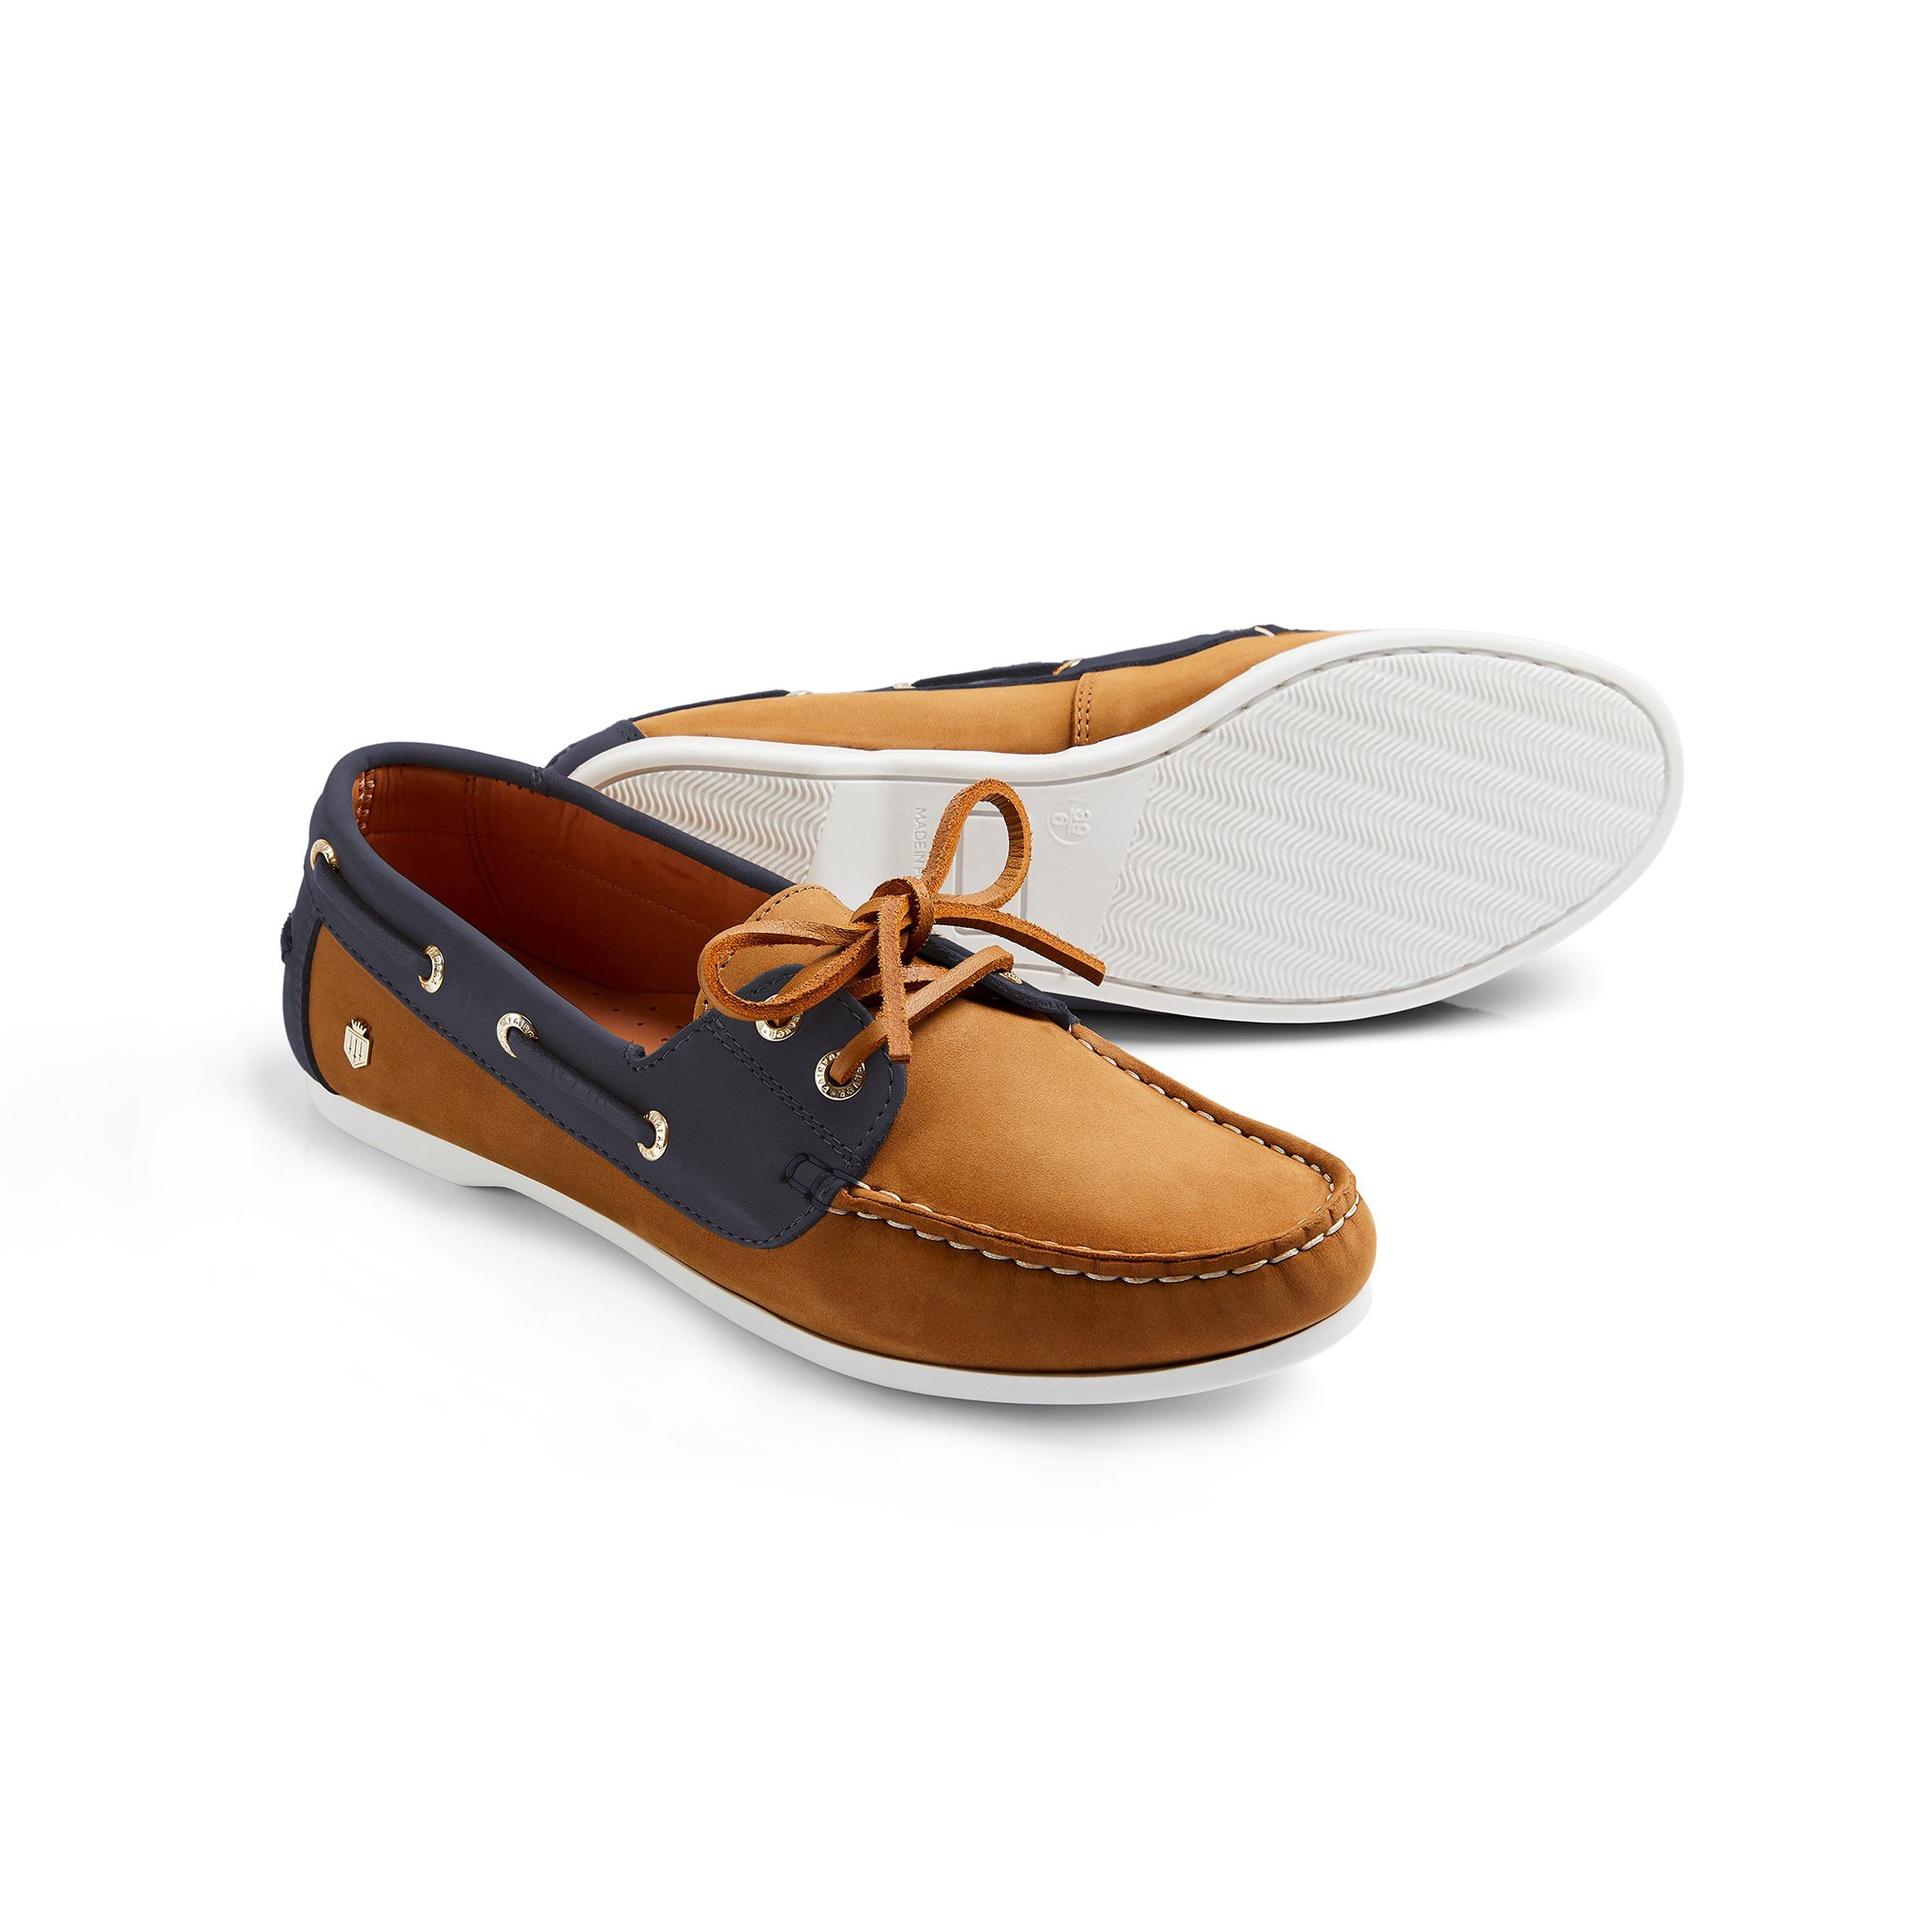 Fairfax & Favor – The Salcombe Deck Shoe – Tan  & Navy